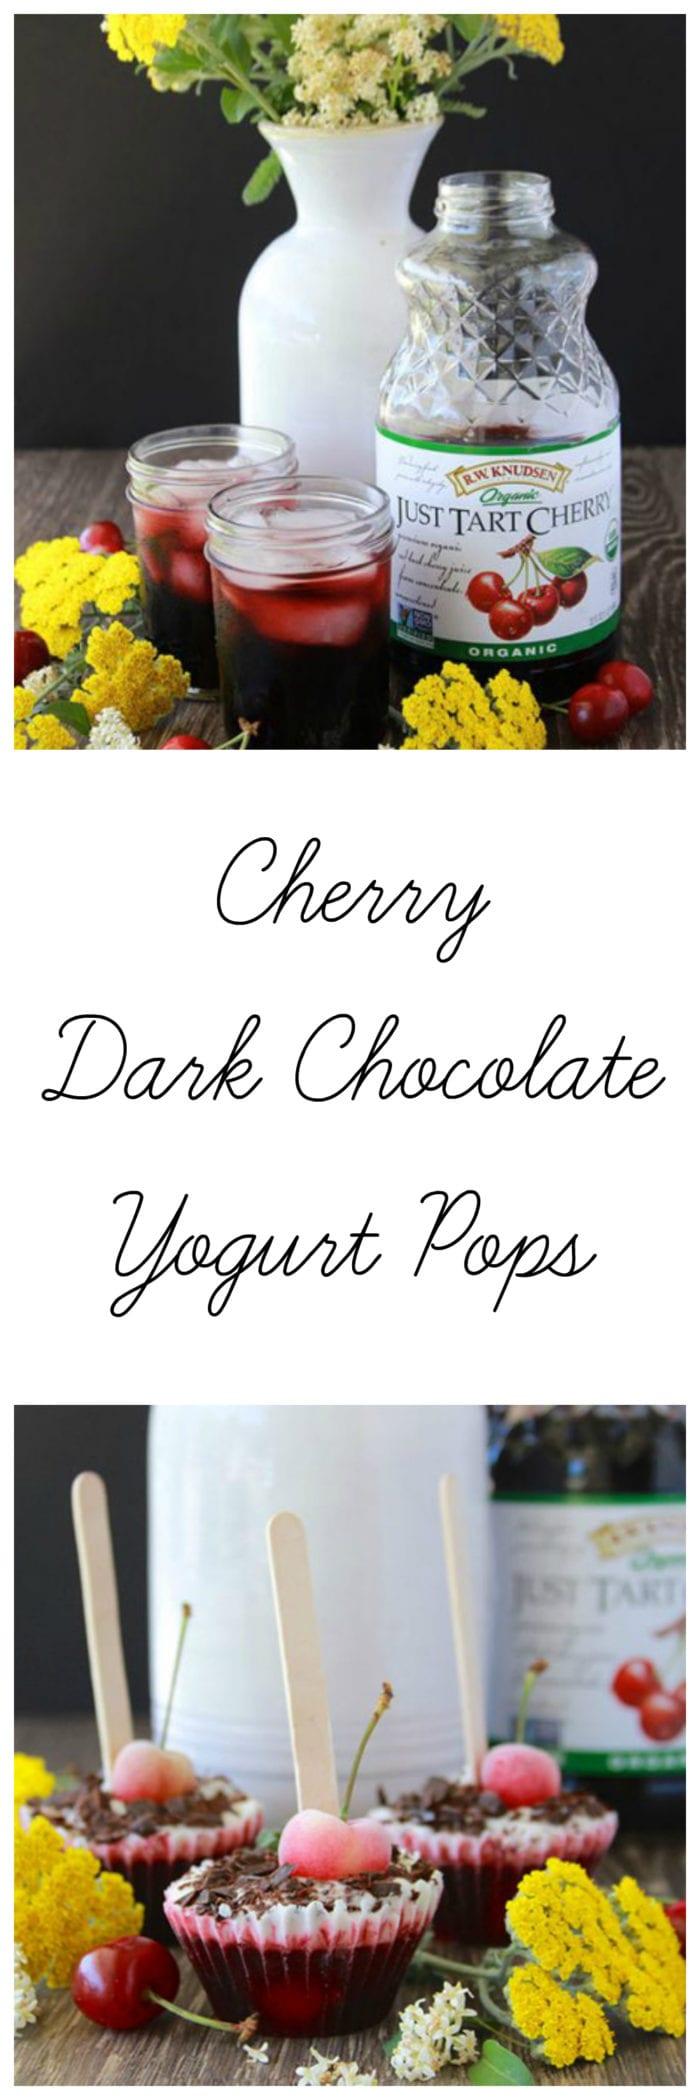 Cherry Dark Chocolate Yogurt Pops will keep you cool this summer! www.cookingwithruthie.com #ad @walmart #KnudsenFarmToBottle #WhatsYourJuiceMadeOf